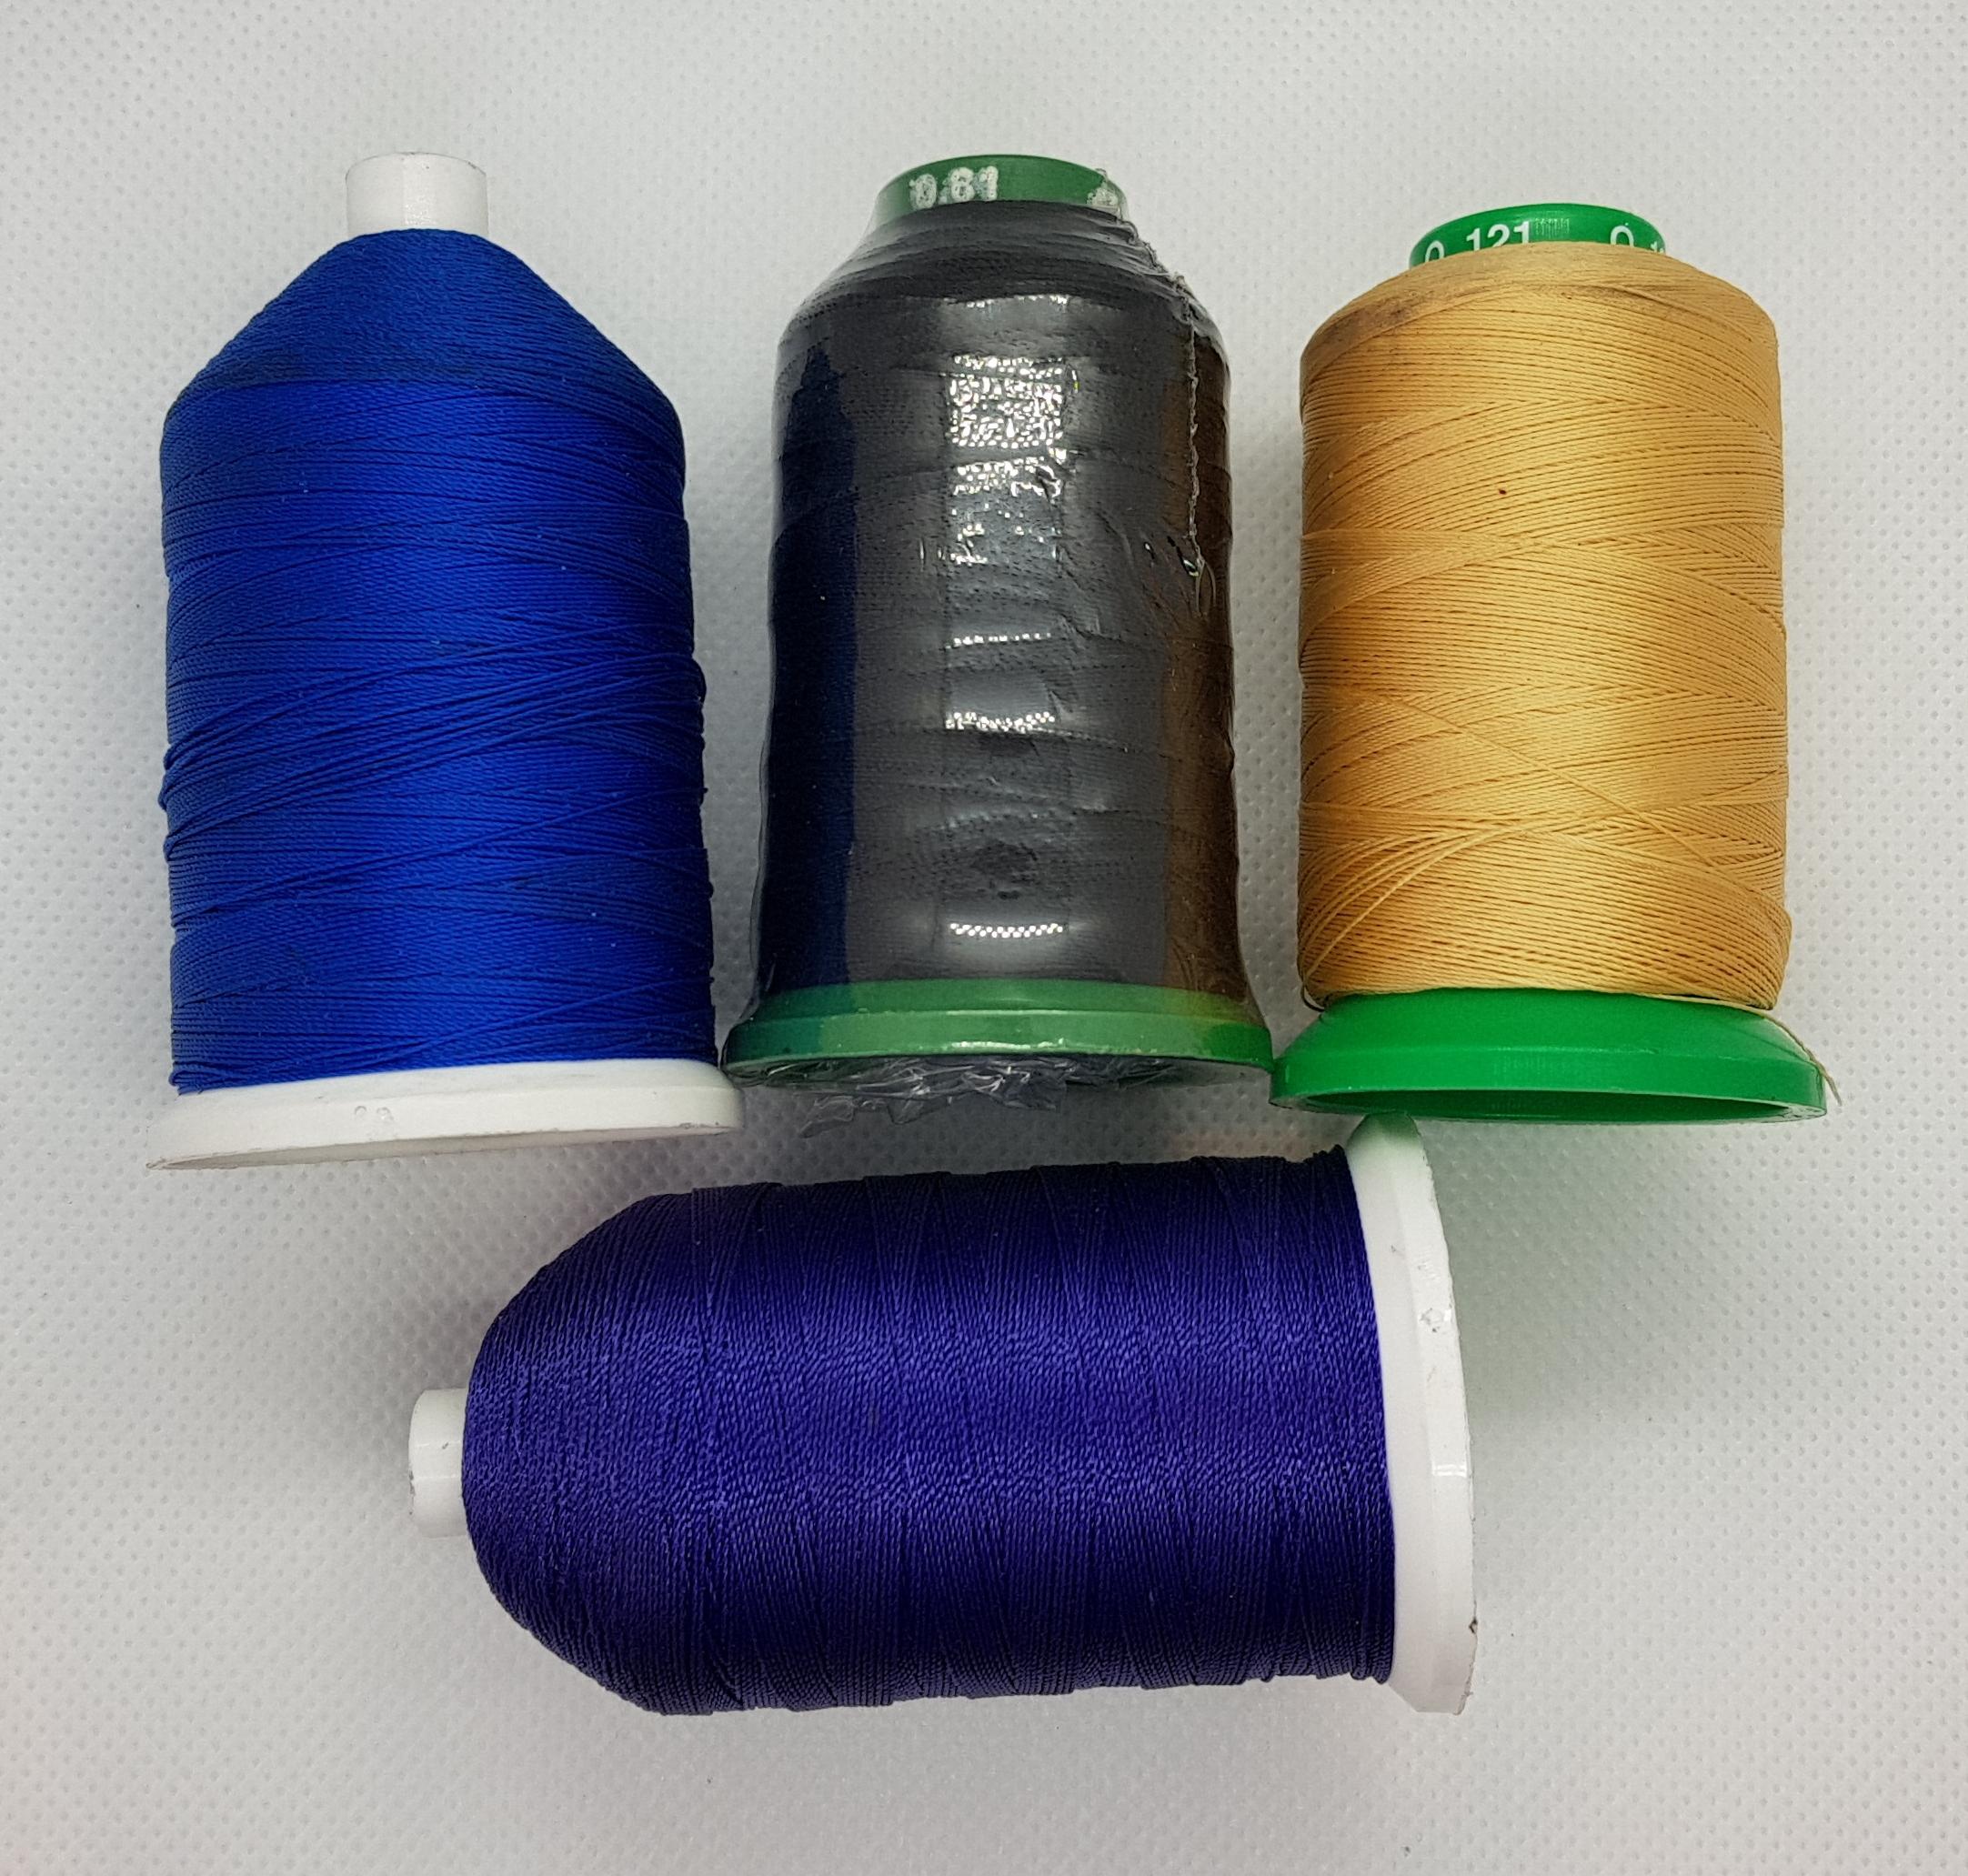 fil onyx pour couture cuir